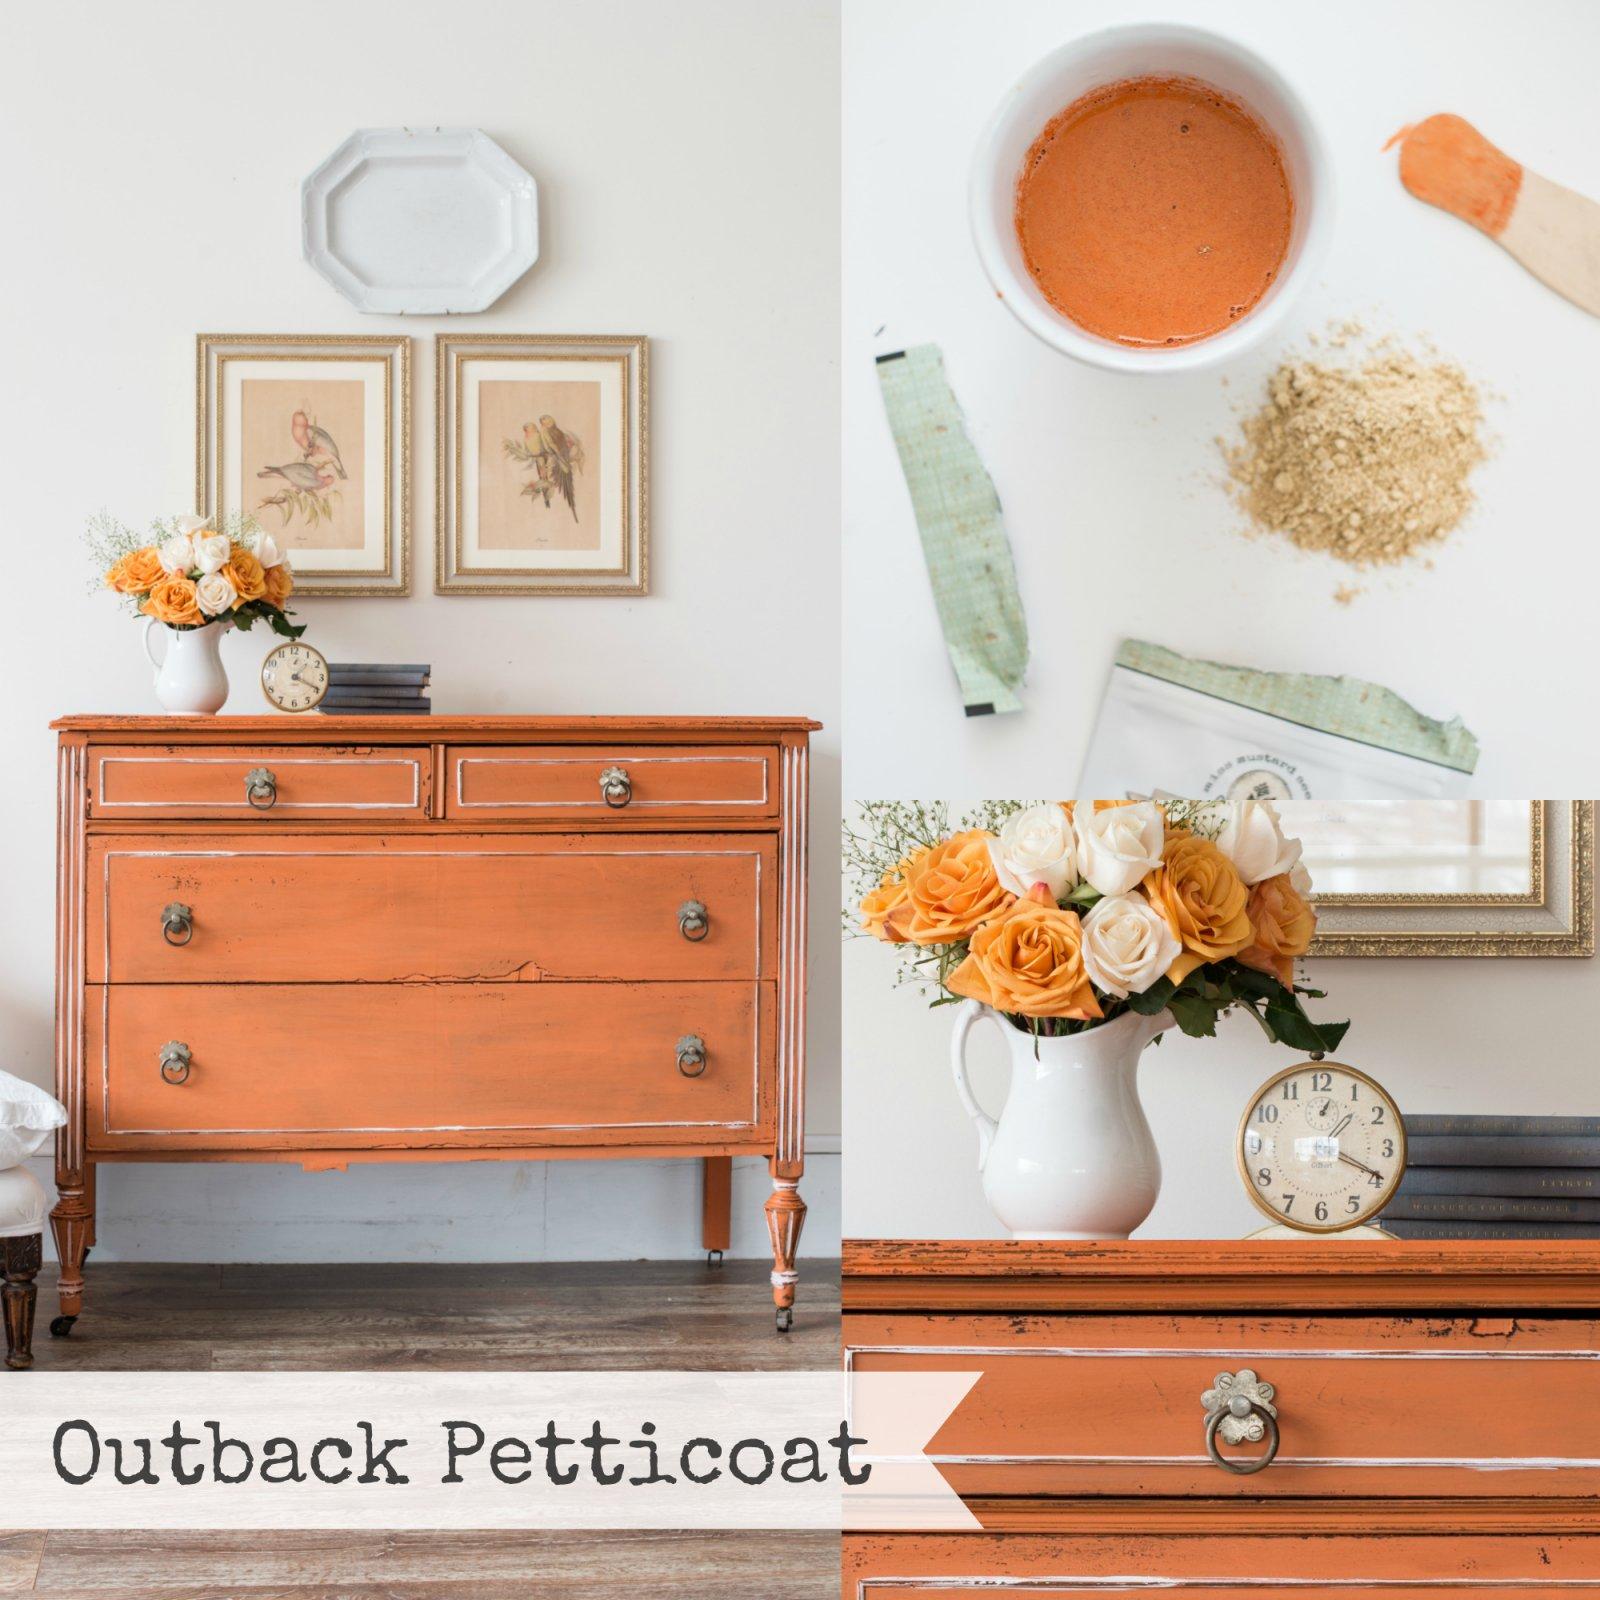 Outback Petticoat Miss Mustard Seed Milk Paint 2 Qt